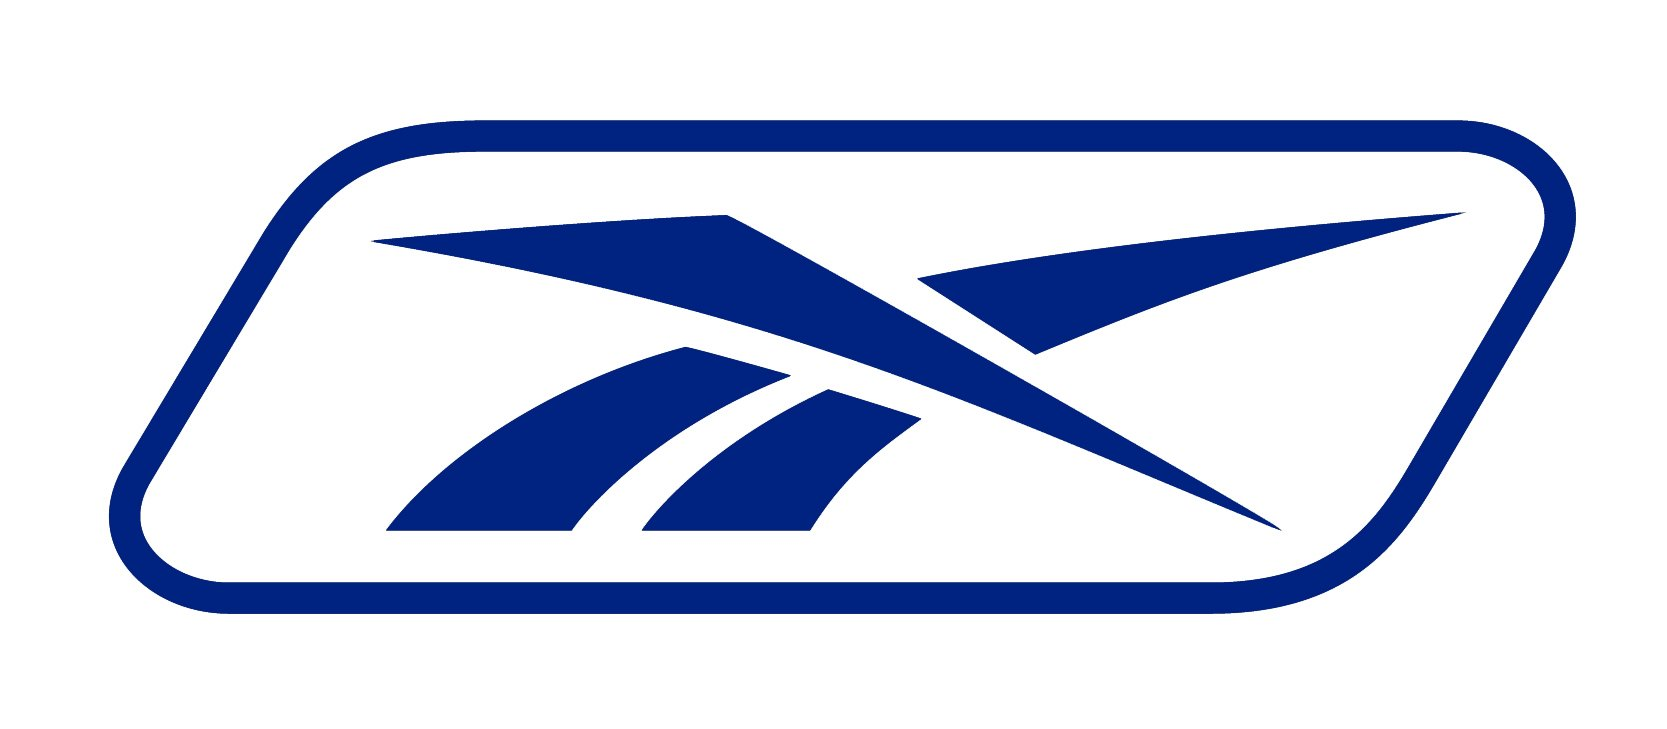 ��ۚ^��r�����_某天在天河天娱广场 见到运动品牌r字头的 logo好像是